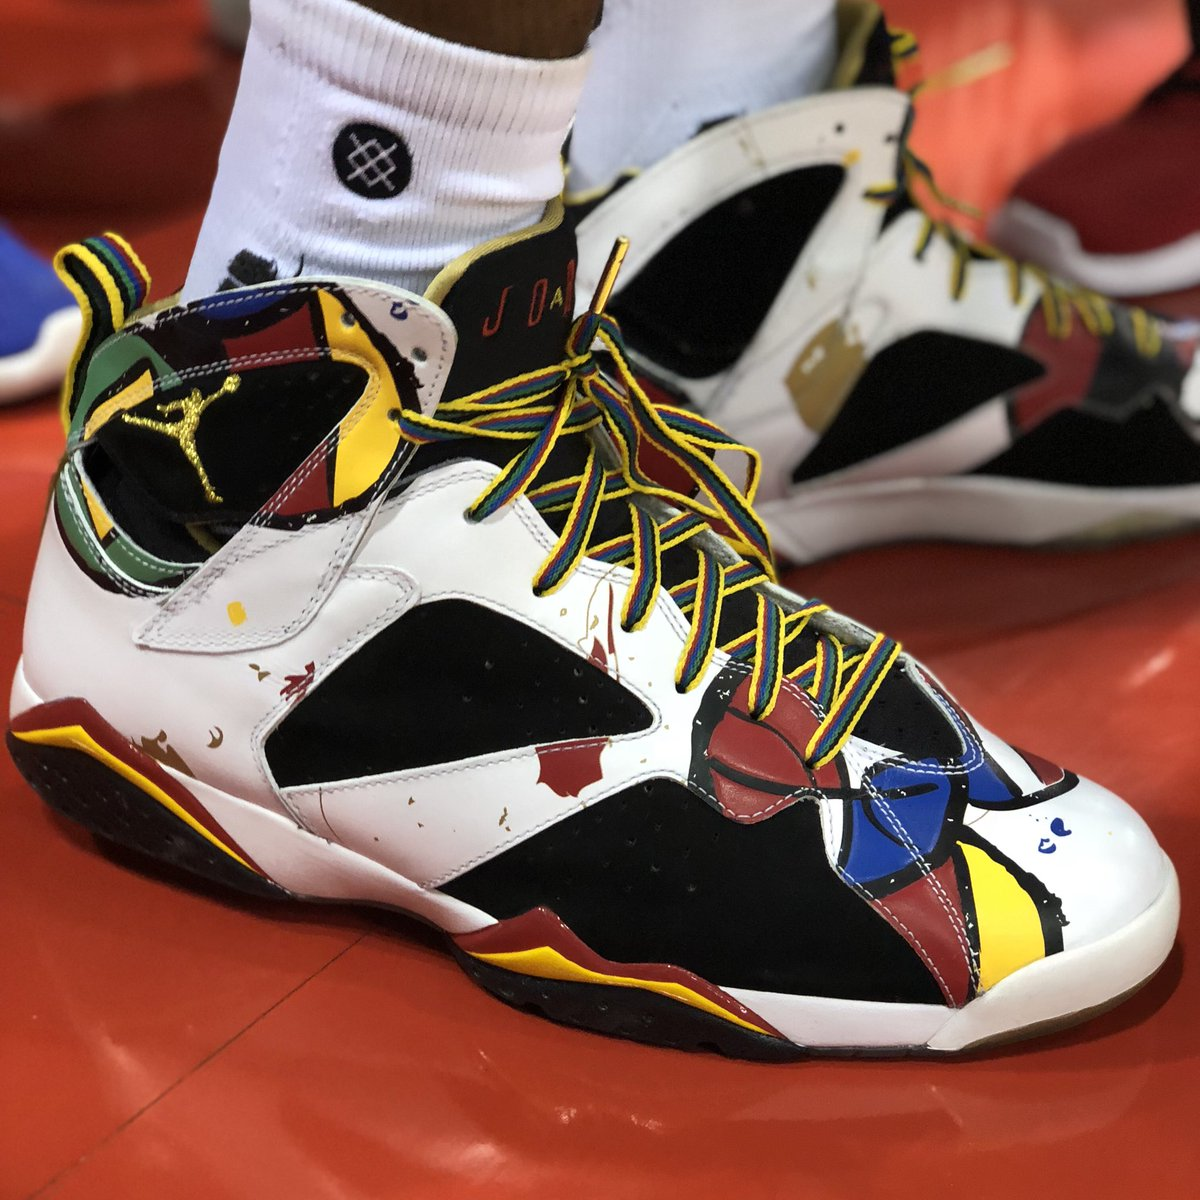 .@ripcityhamilton bringing the 🔥👟 to @NBASummerLeague 👀  #NBAKicks